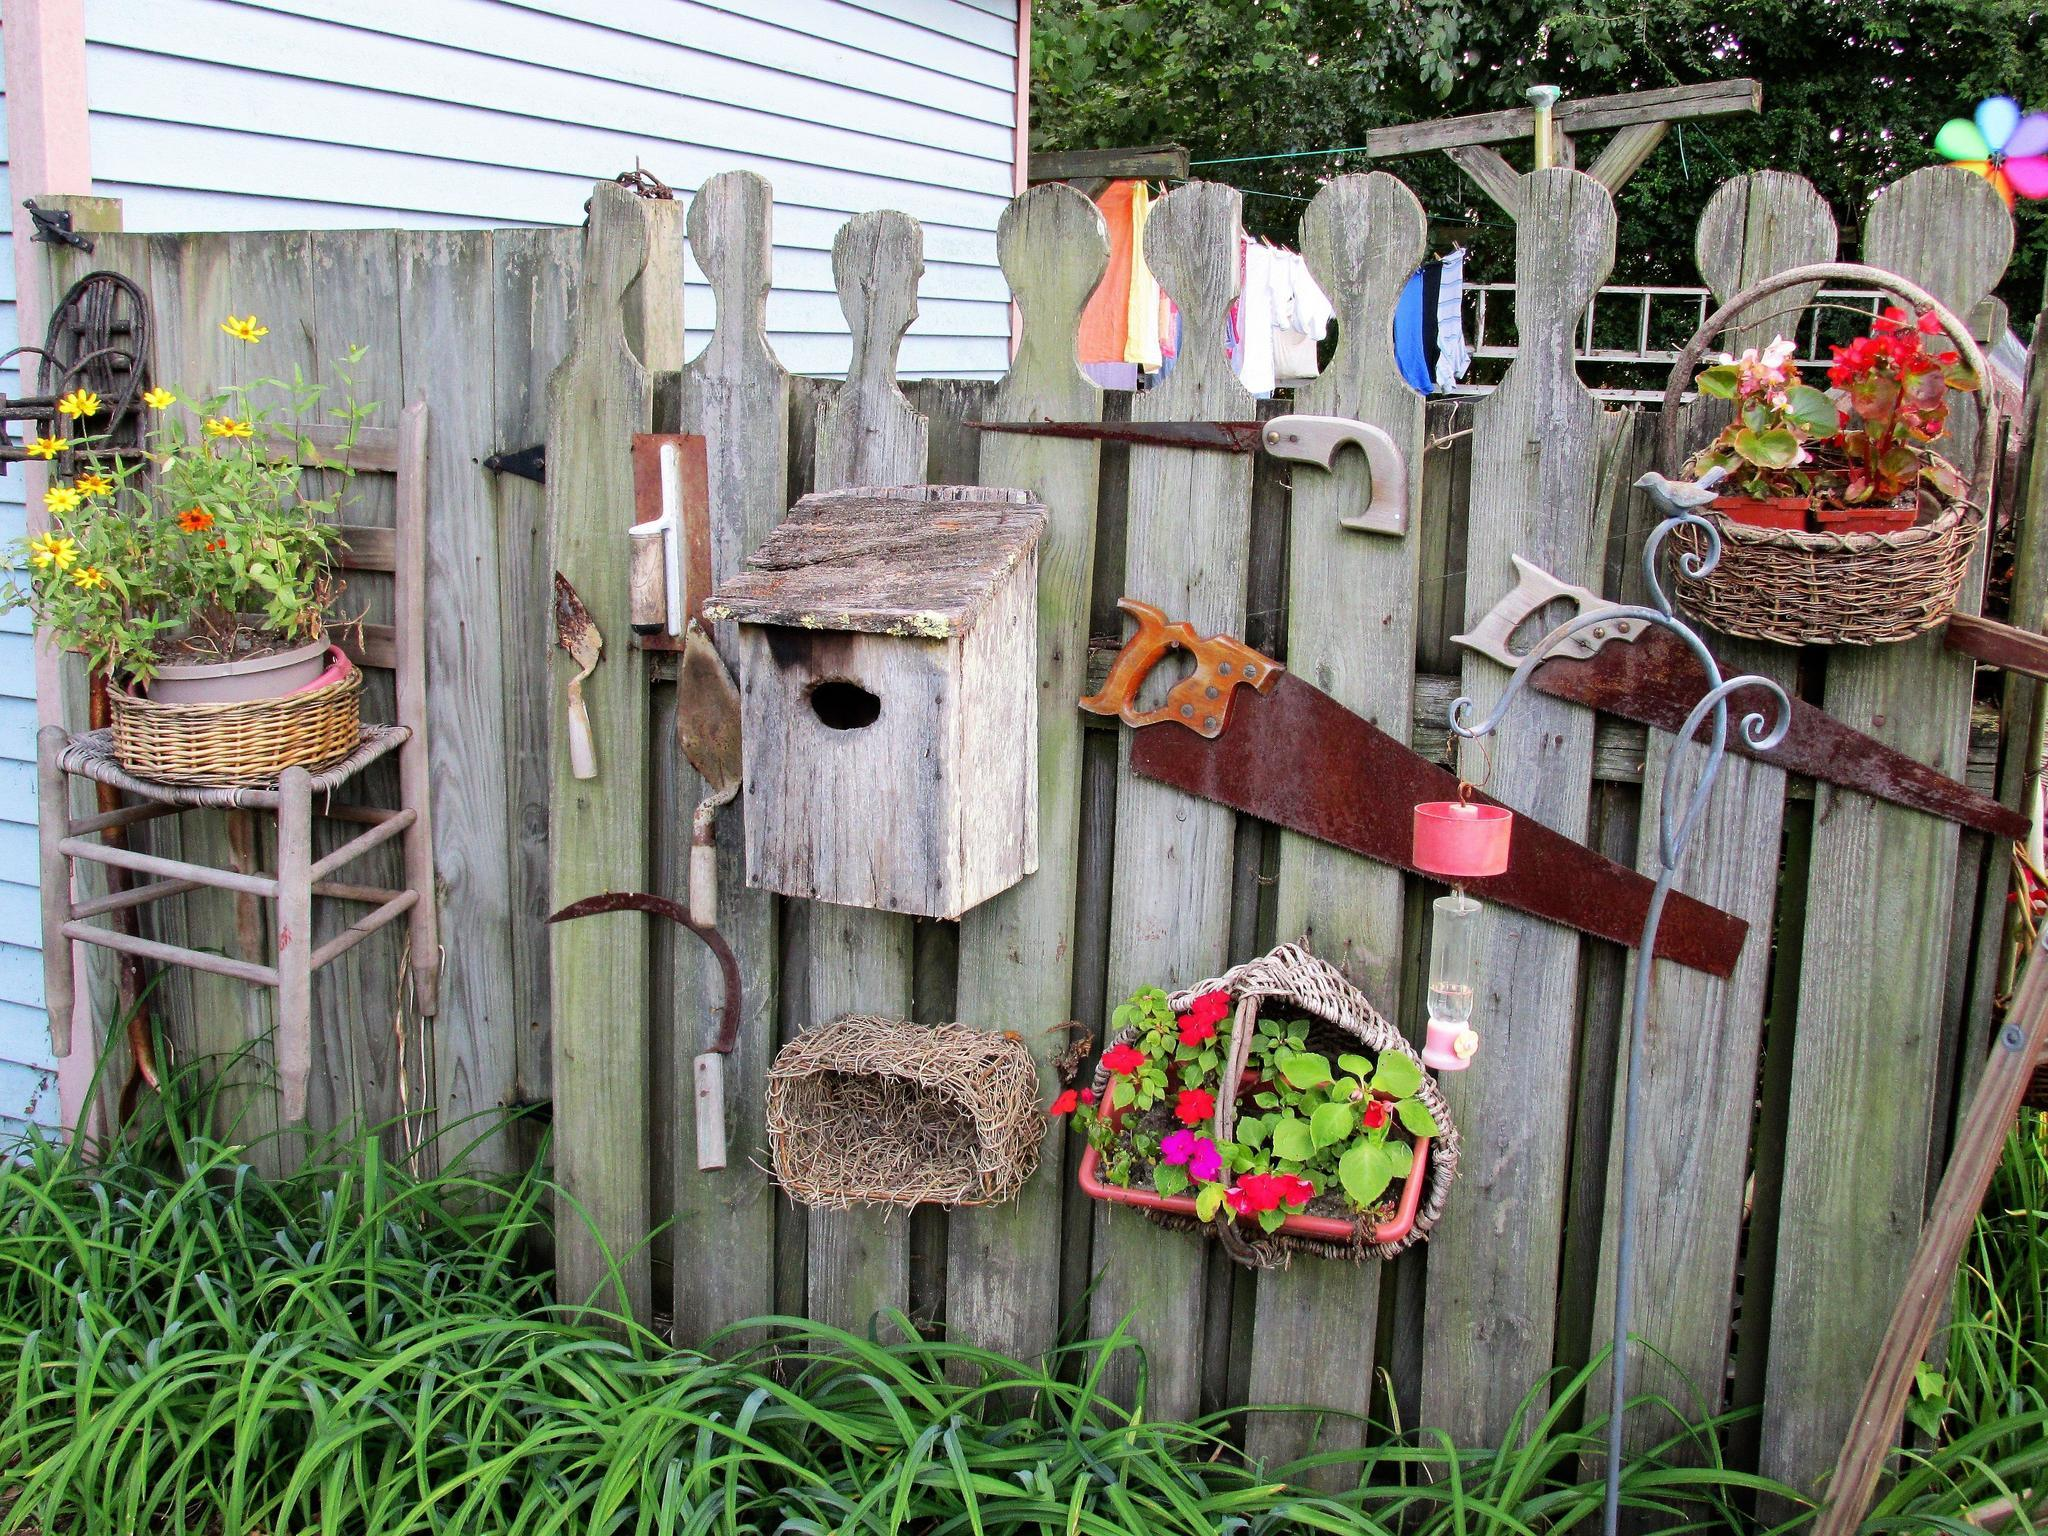 Diggin In Gardening Trends From Uberizing To Minimizing